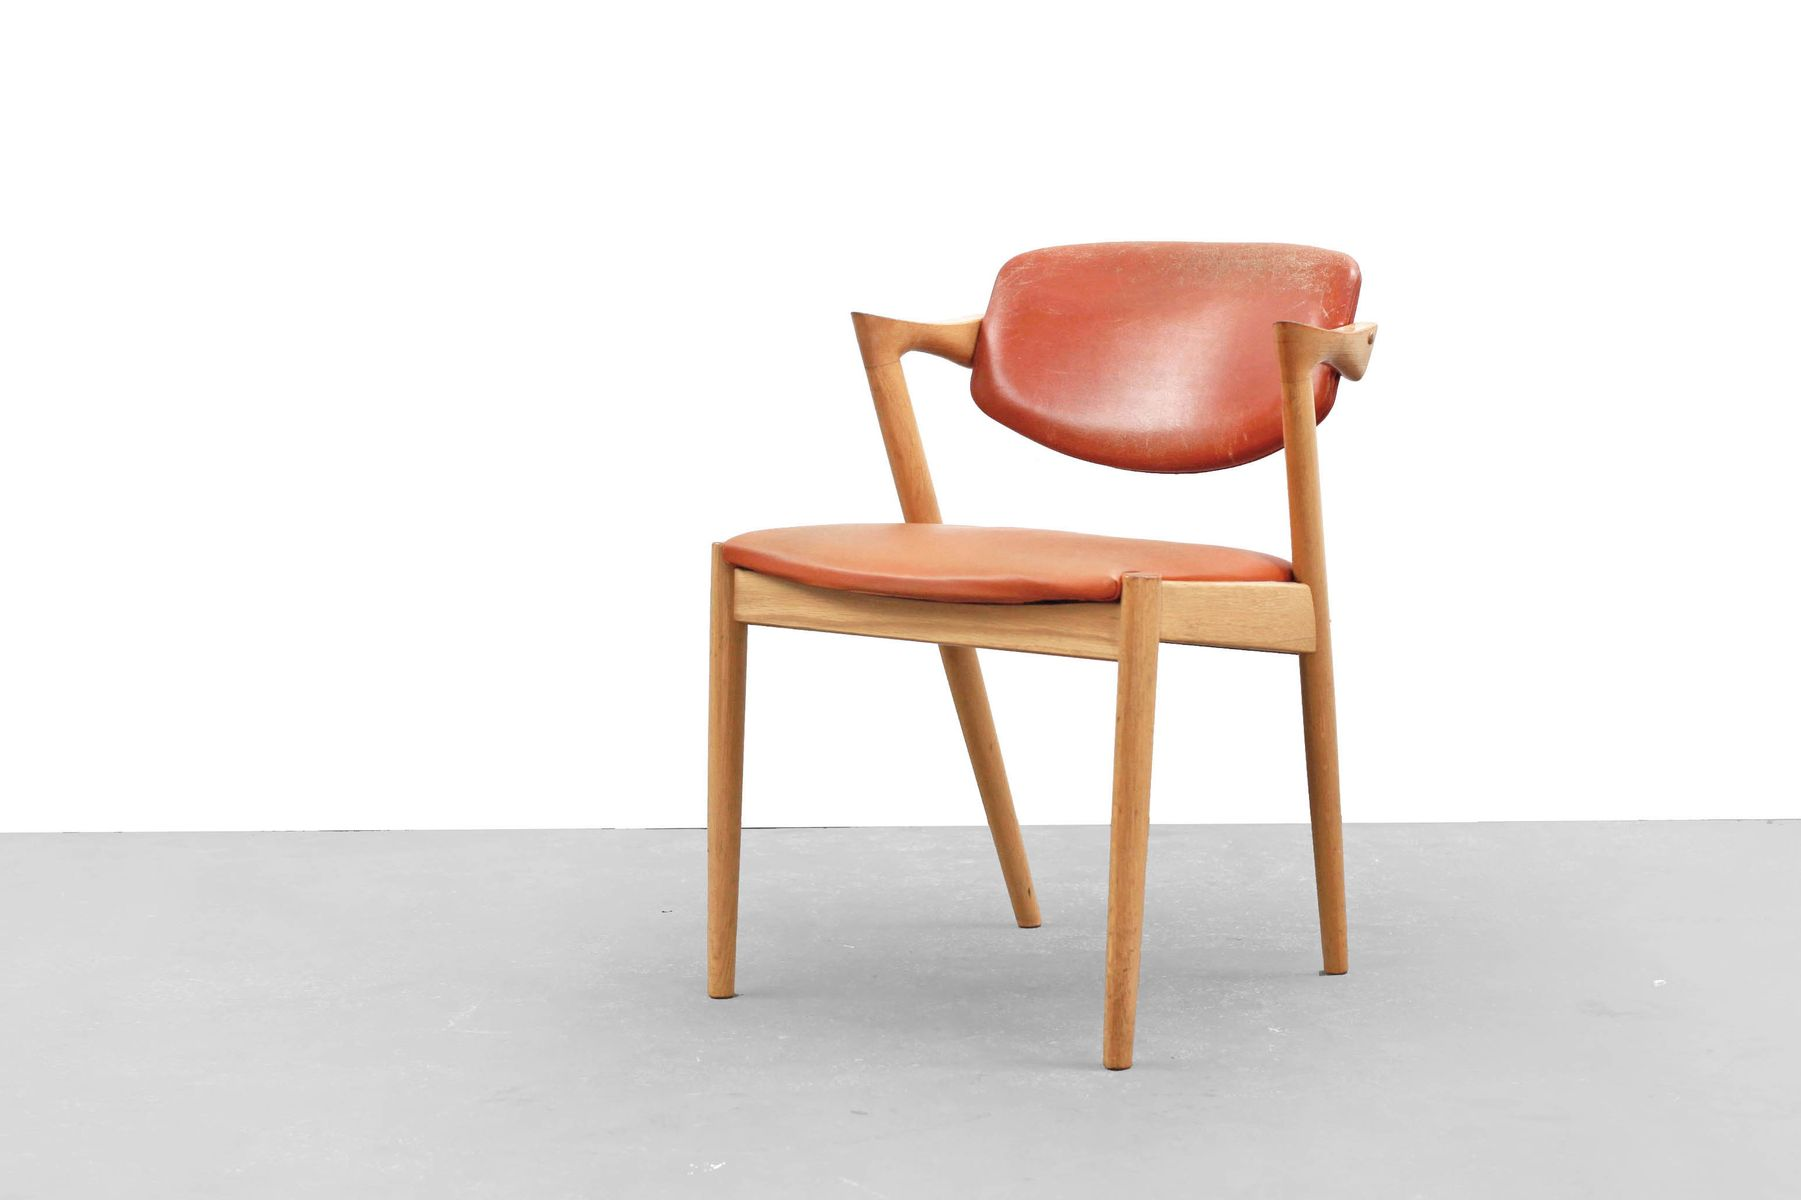 Danish modern oak chair no 42 by kai kristiansen for schou andersen 1960s for sale at pamono - Kai kristiansen chair ...